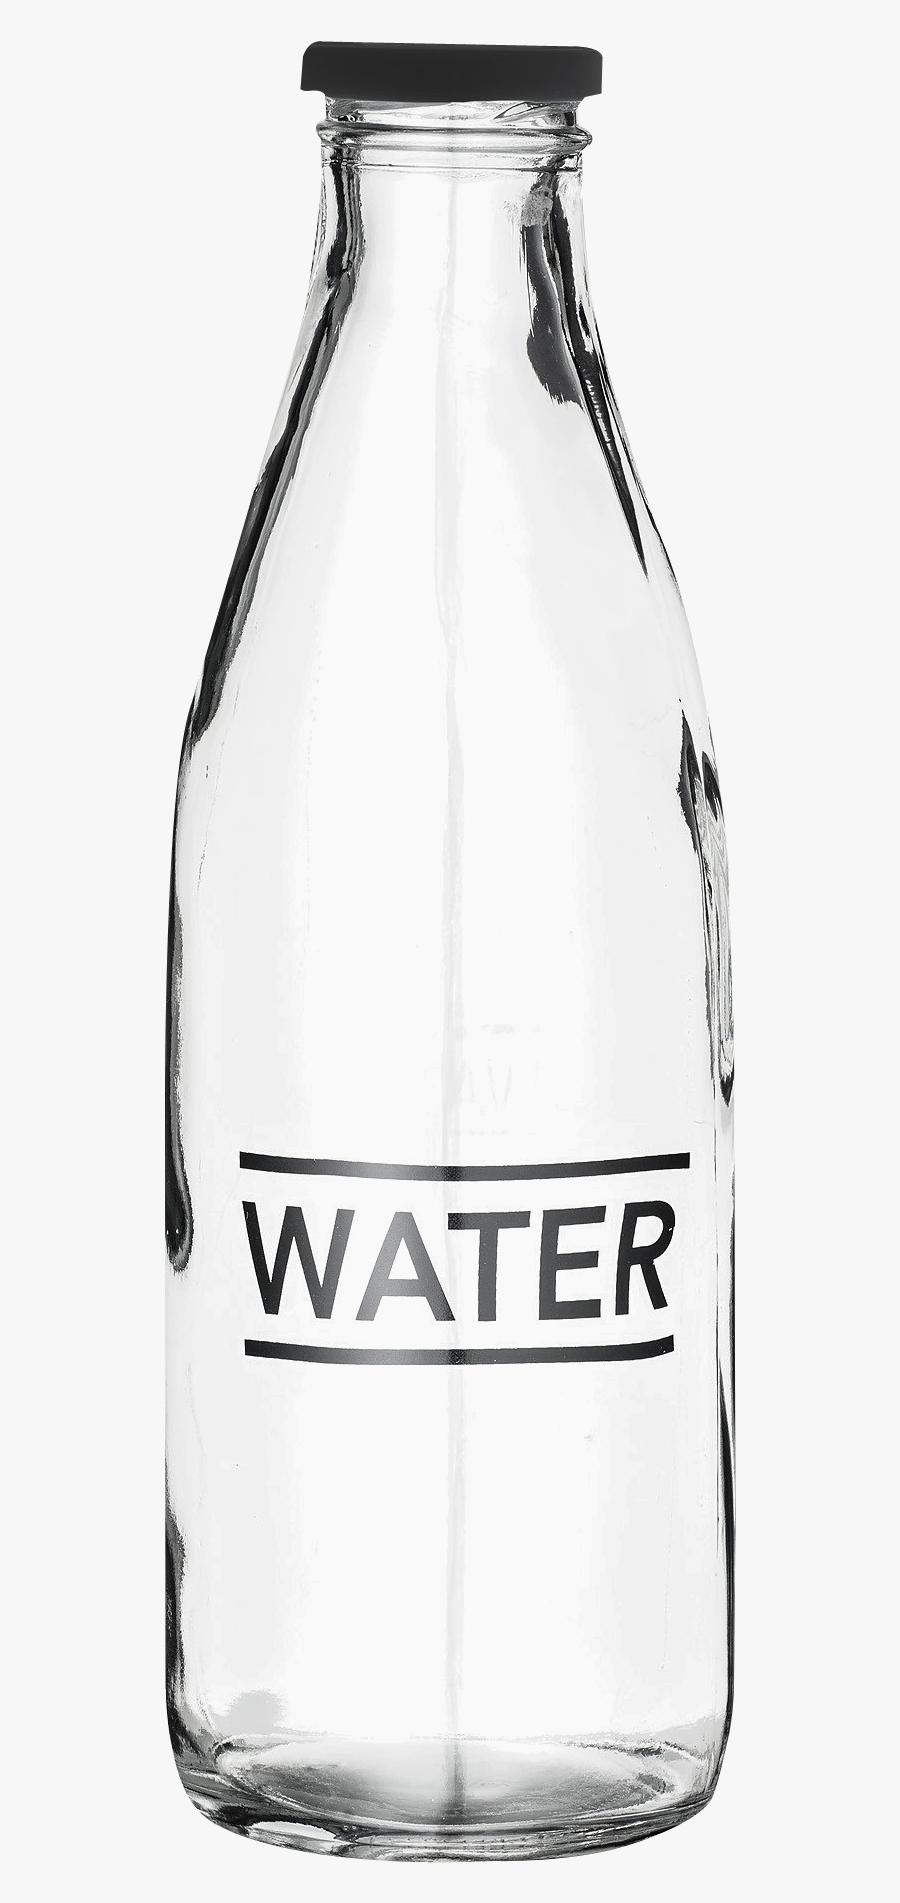 Best Water Bottle Png Clipart - Glass Water Bottle Transparent, Transparent Clipart